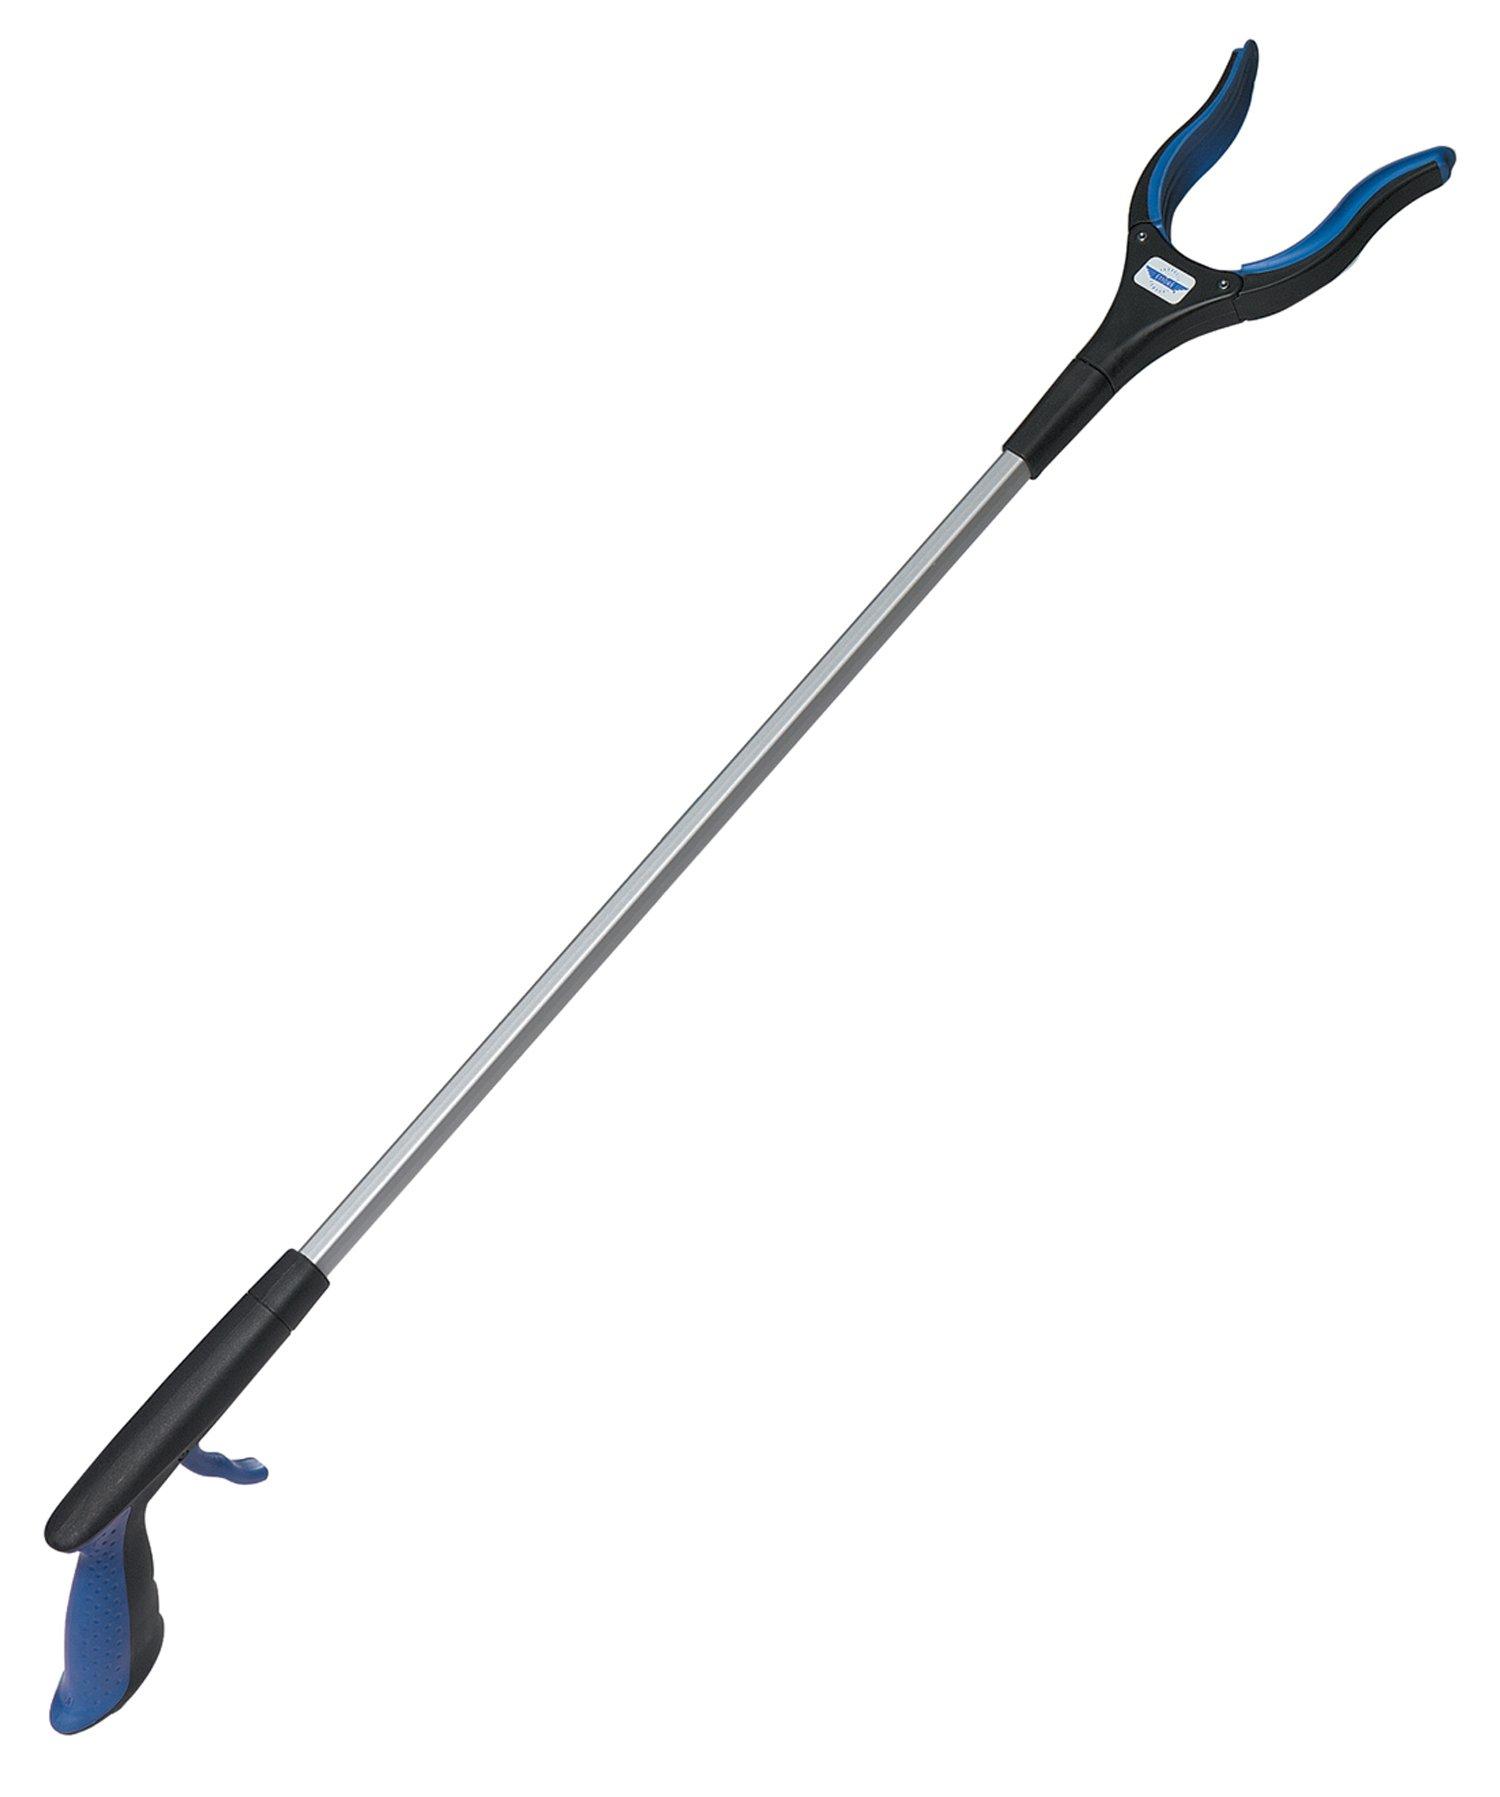 Ettore 49036 Grip'n Grab Reach Tool, 34-Inch by Ettore